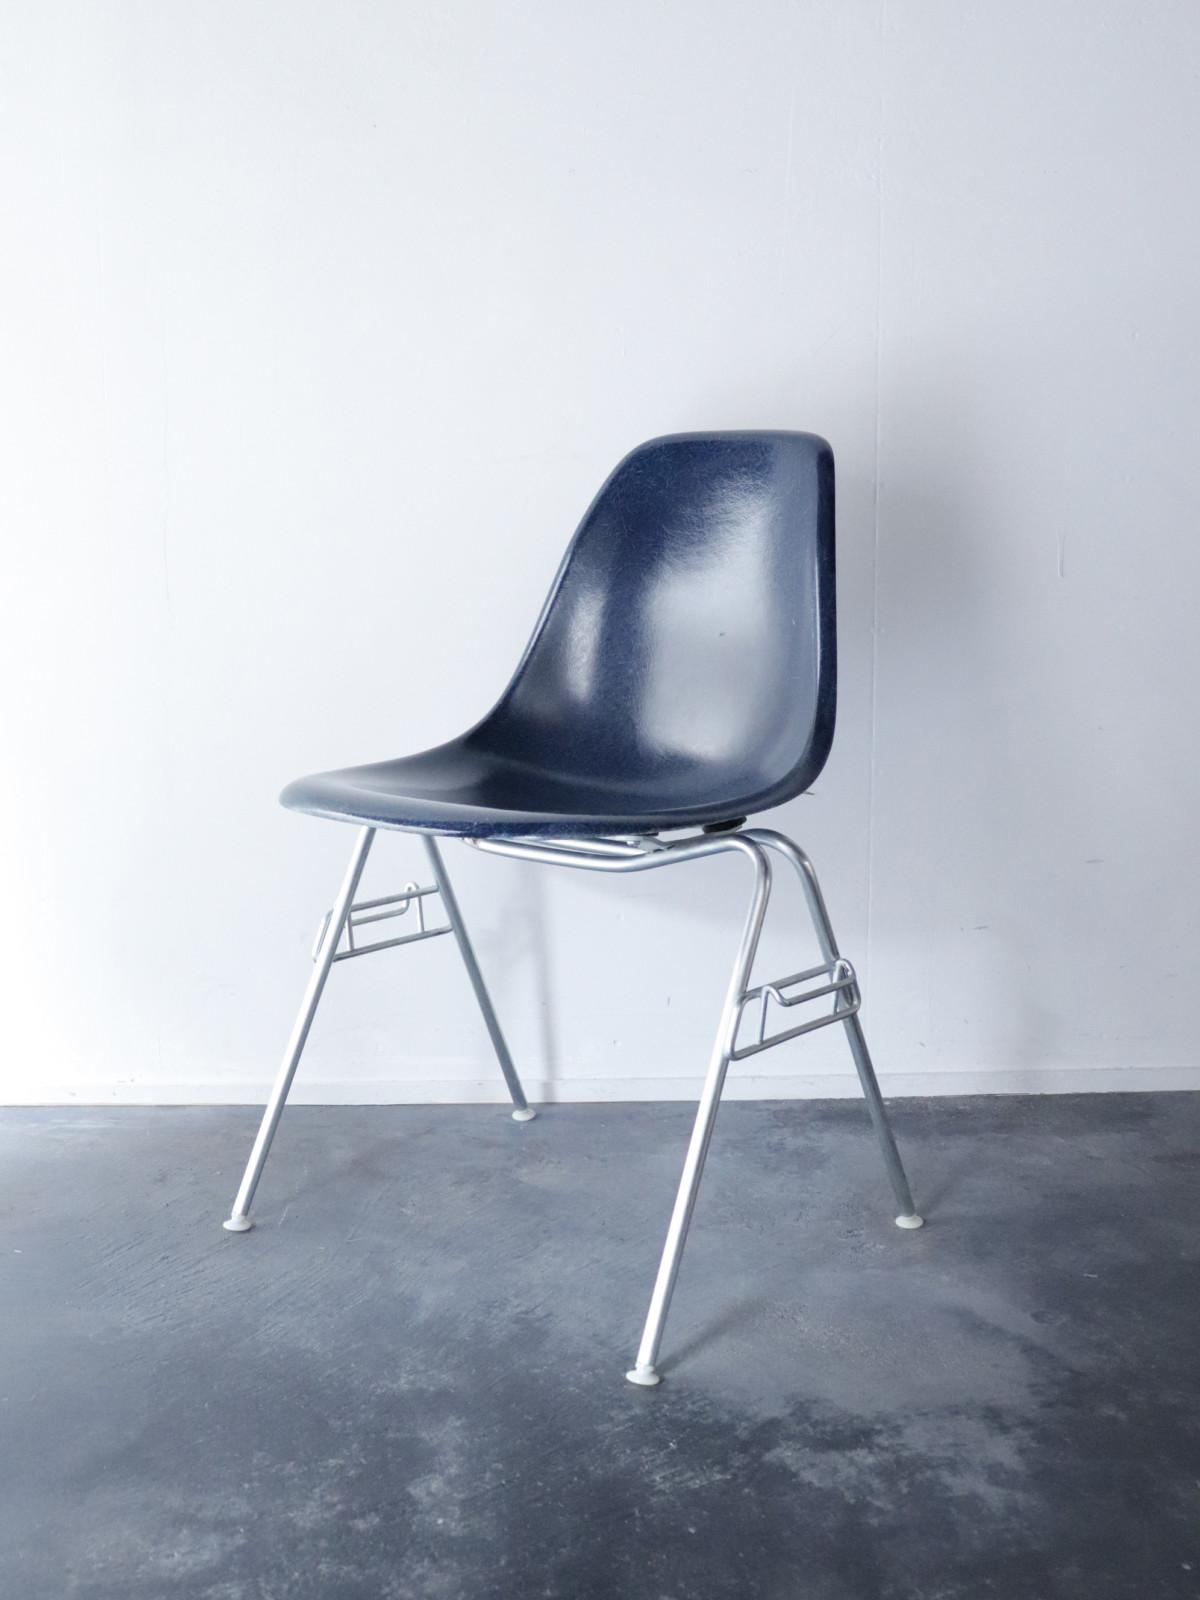 1960's, Eames, Herman Miller, chair